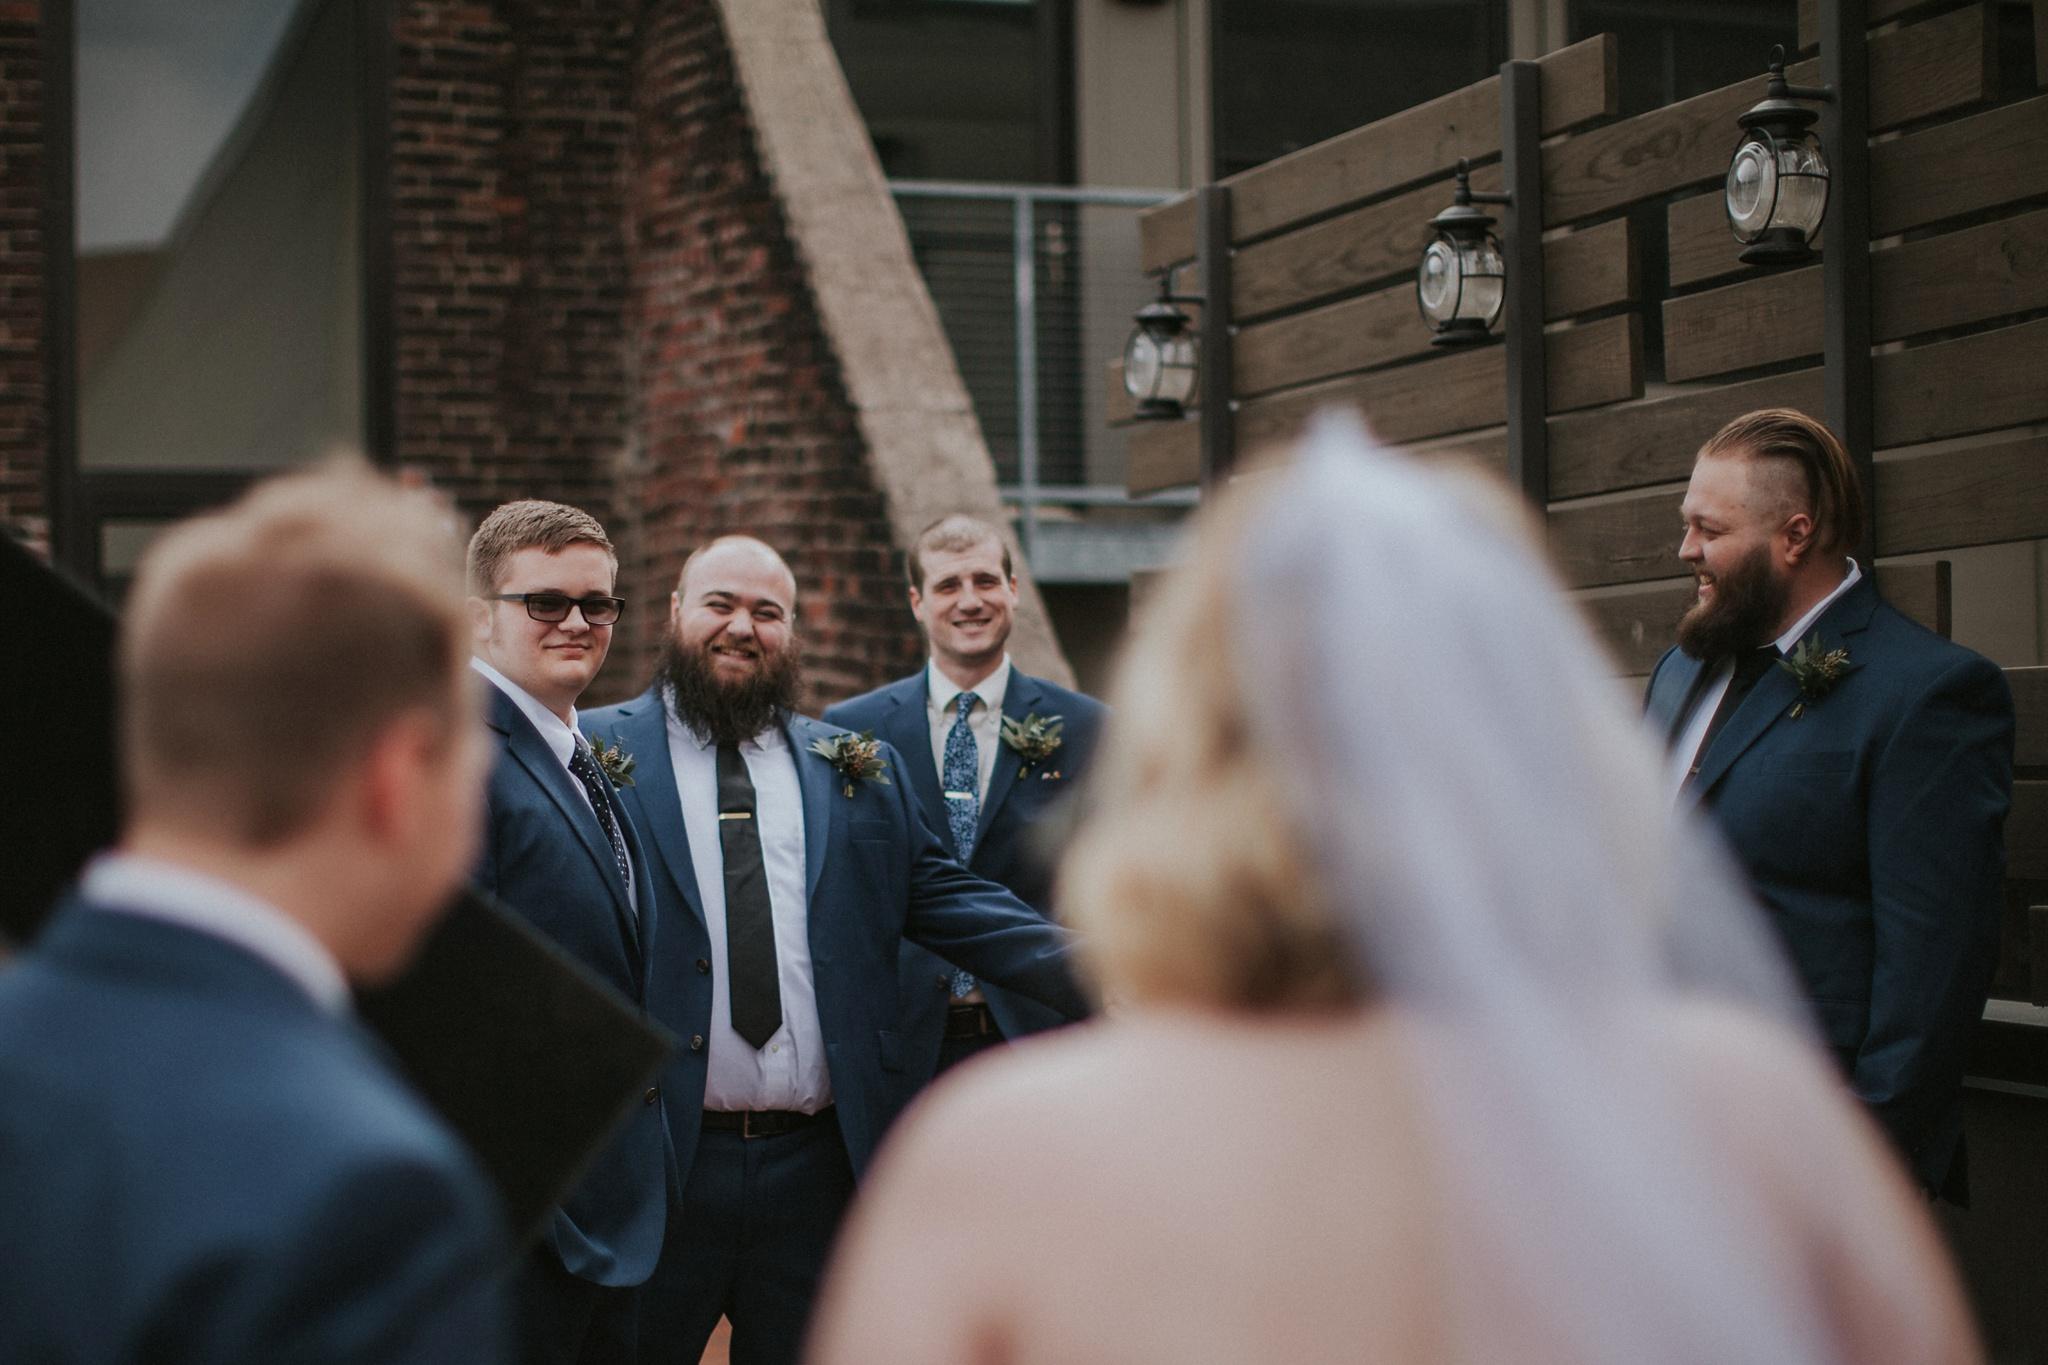 Downtown-Louisville-Surprise-Wedding_0020.jpg